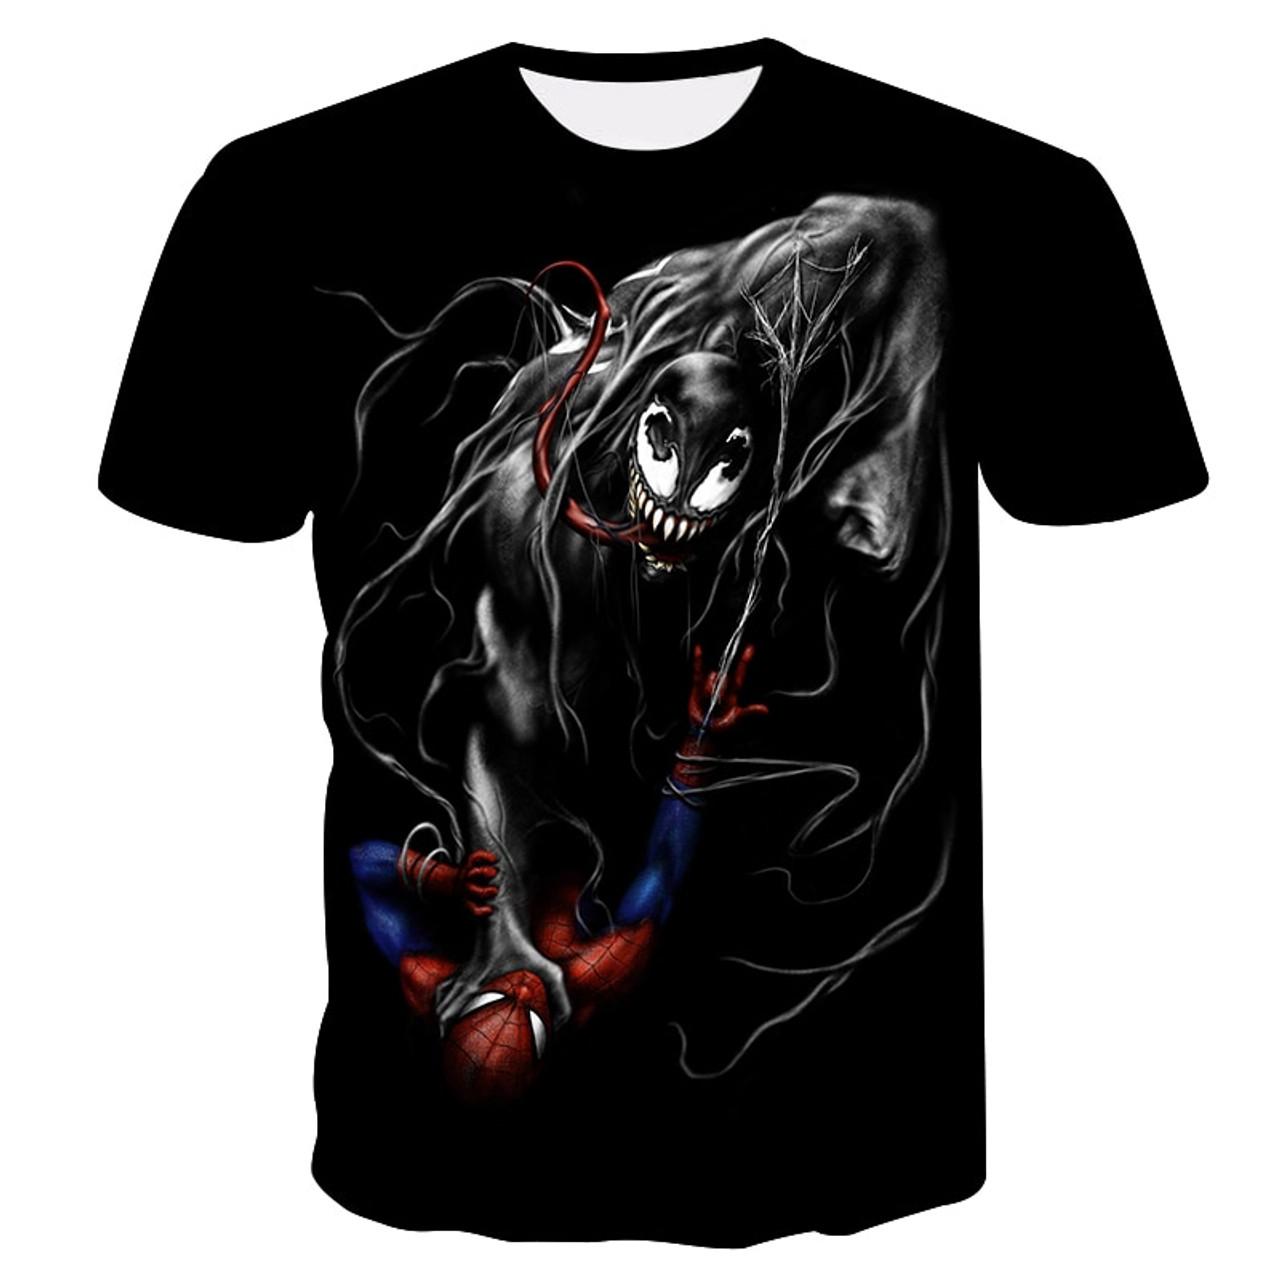 2cc24c78532 ... 2019 new venom men s t-shirt 3D printing Marvel series casual shirt  summer cool T ...